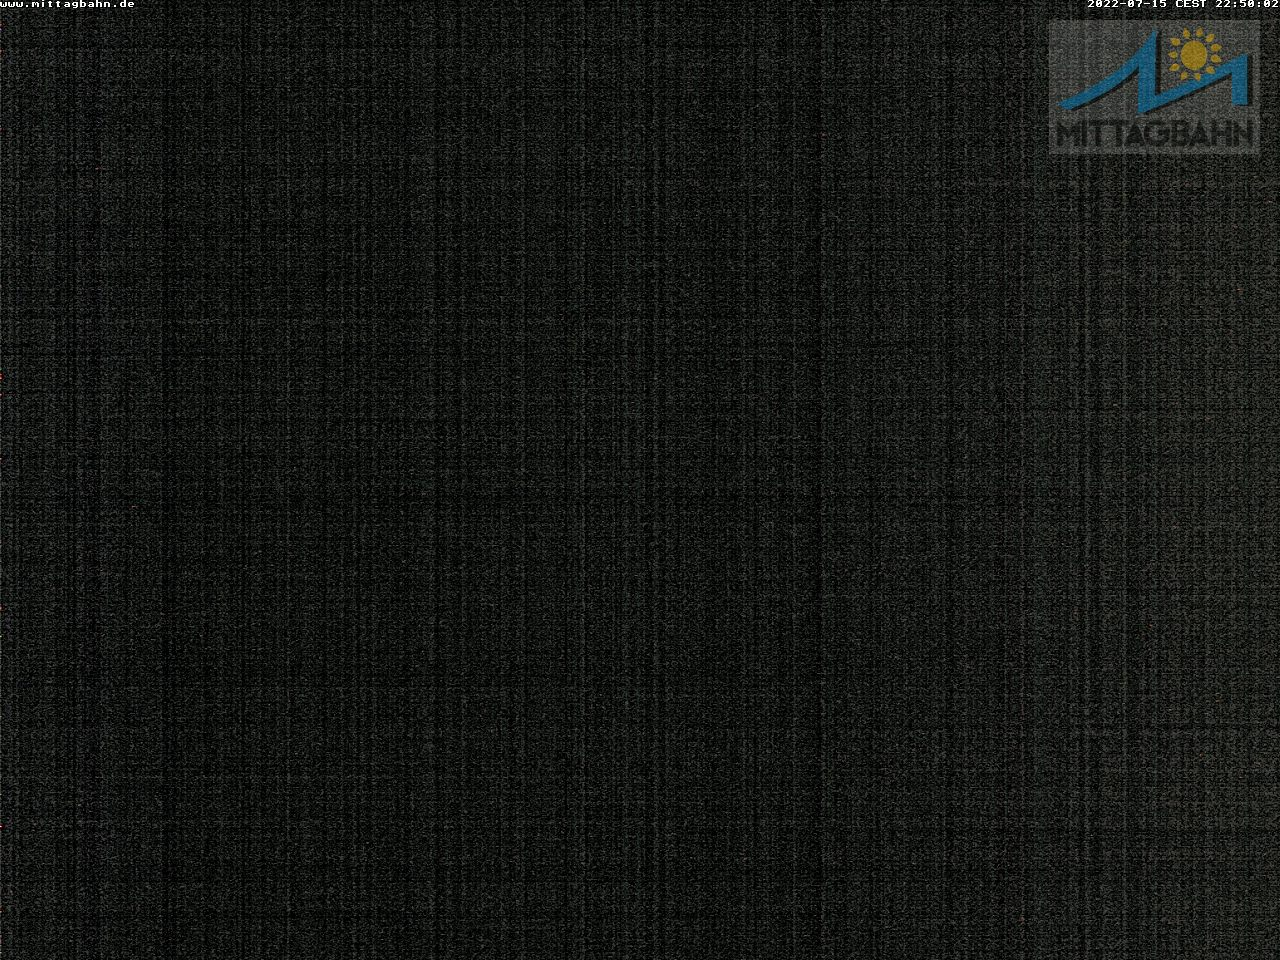 Webcam Skigebied Immenstadt - Mittag cam 4 - Allgäuer Alpen